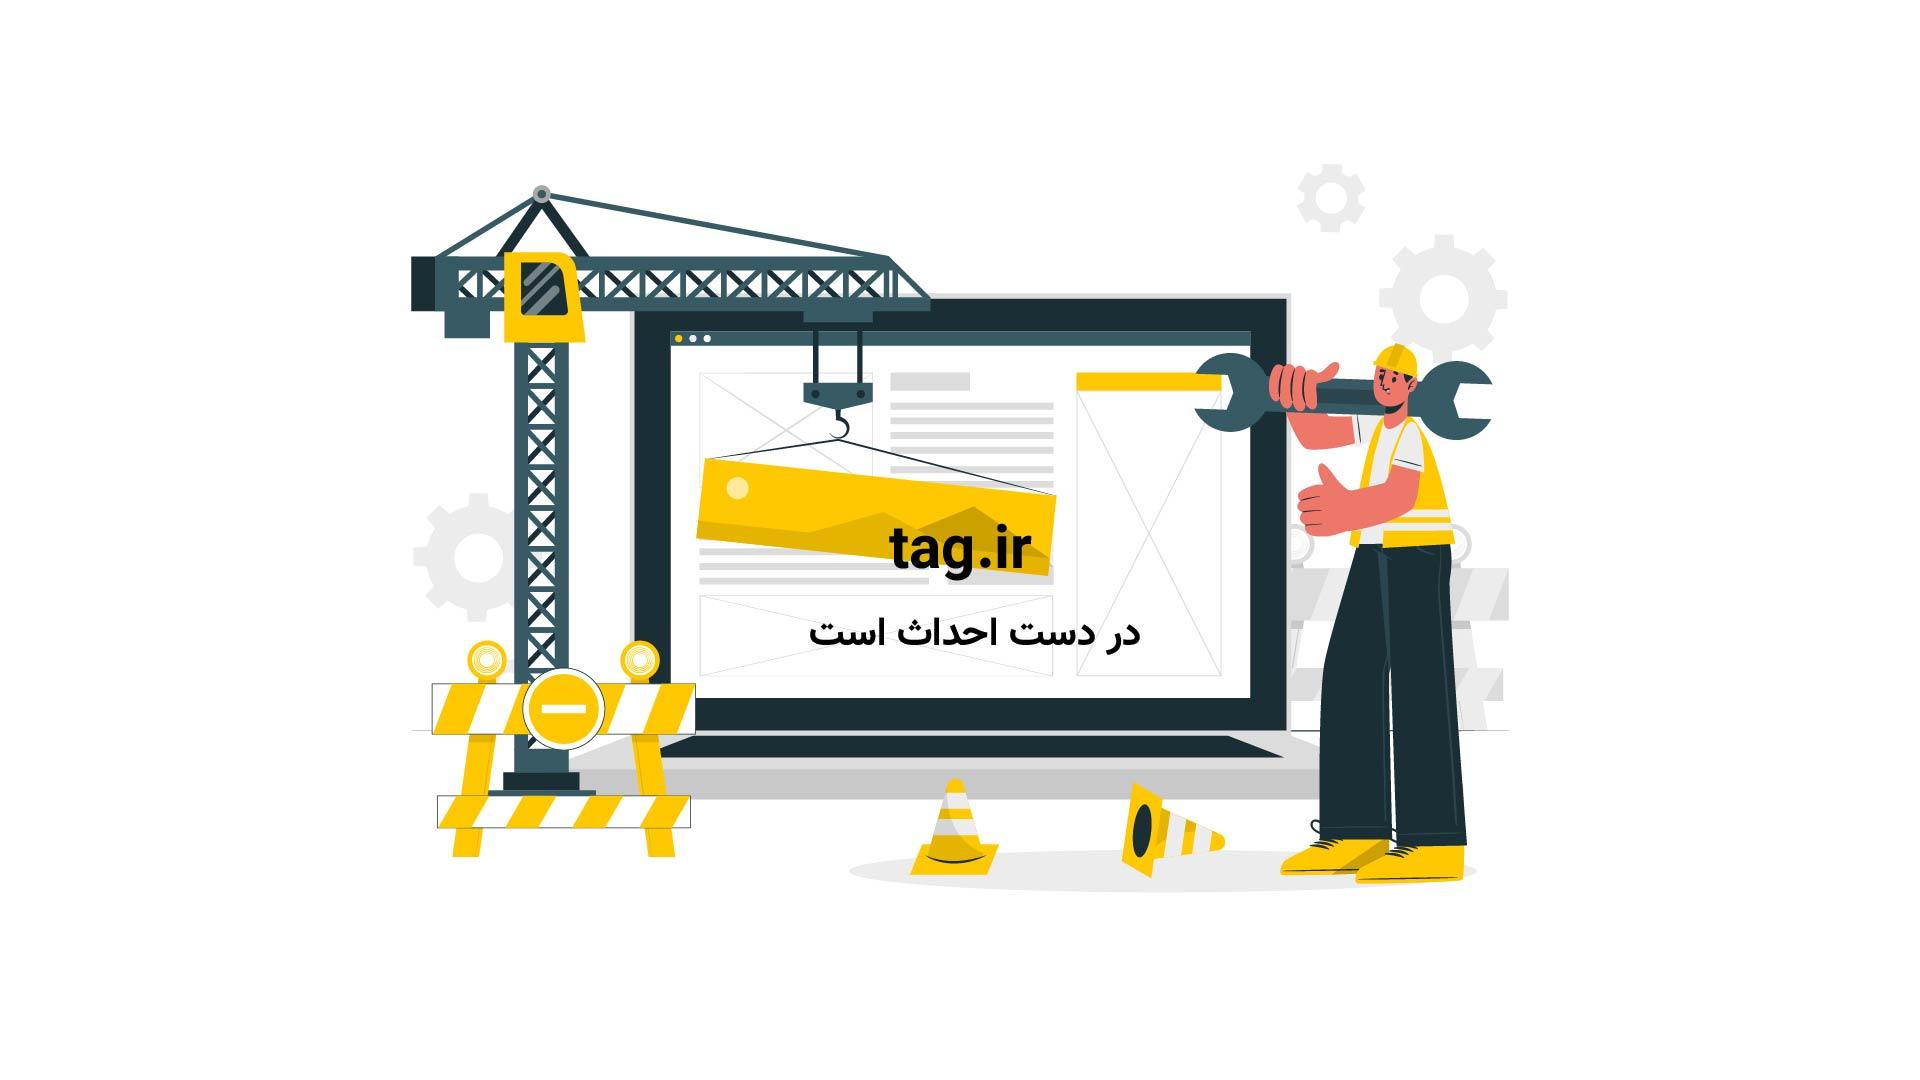 طوفان آذرخشی آمریکا | تگ